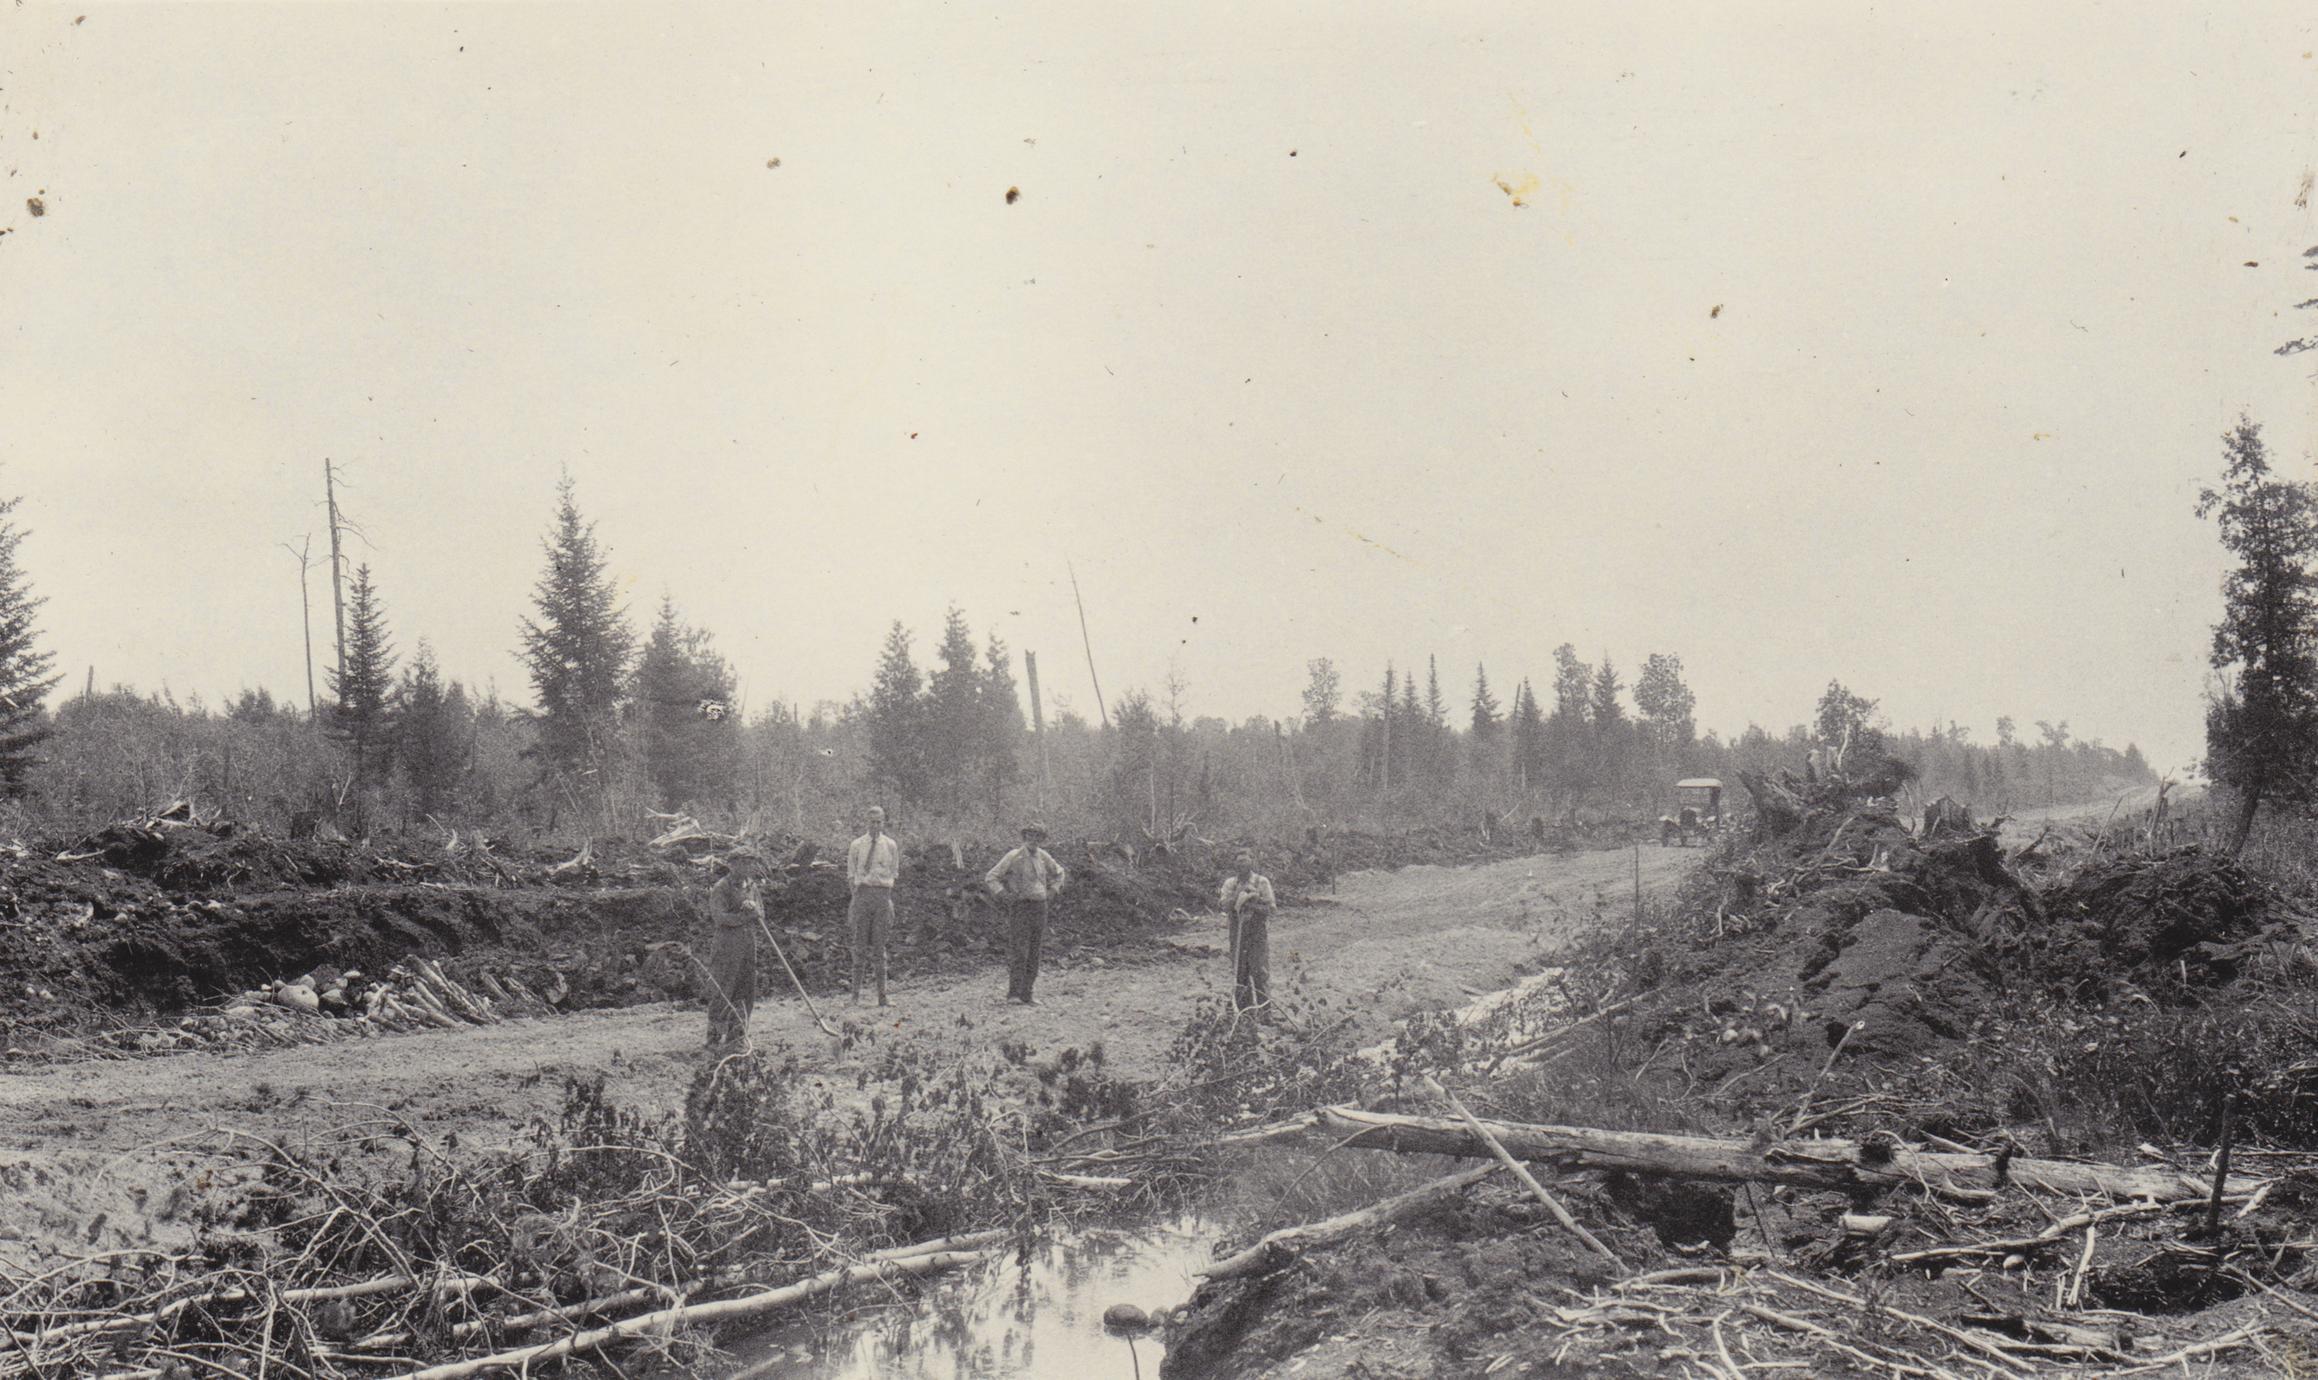 Highway 16 sinkhole